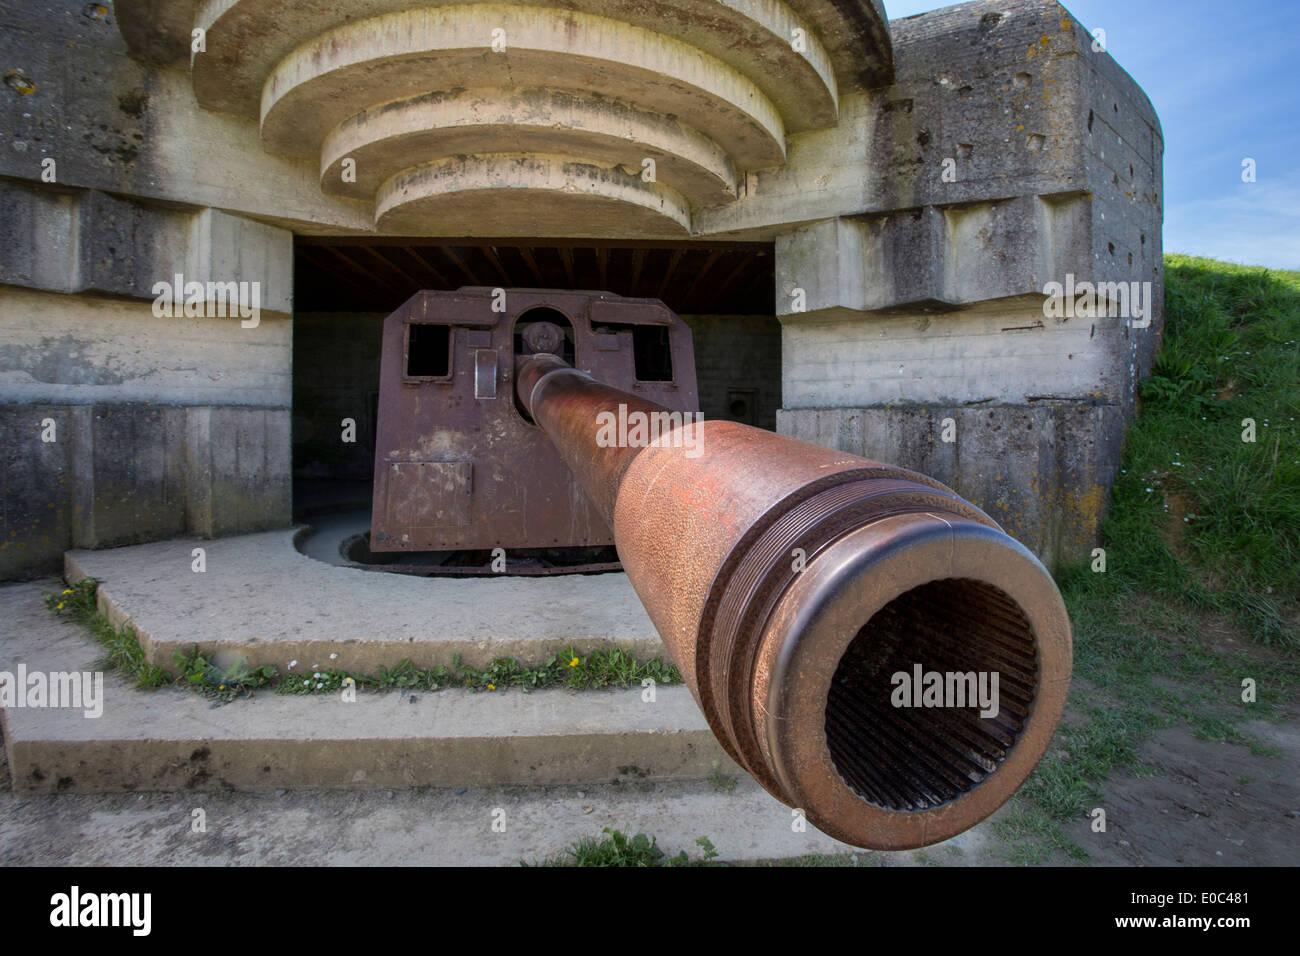 GERMAN DEFENSIVE BATTERIES GUN EMPLACEMENT SCHIFFER MILITARY СКАЧАТЬ БЕСПЛАТНО